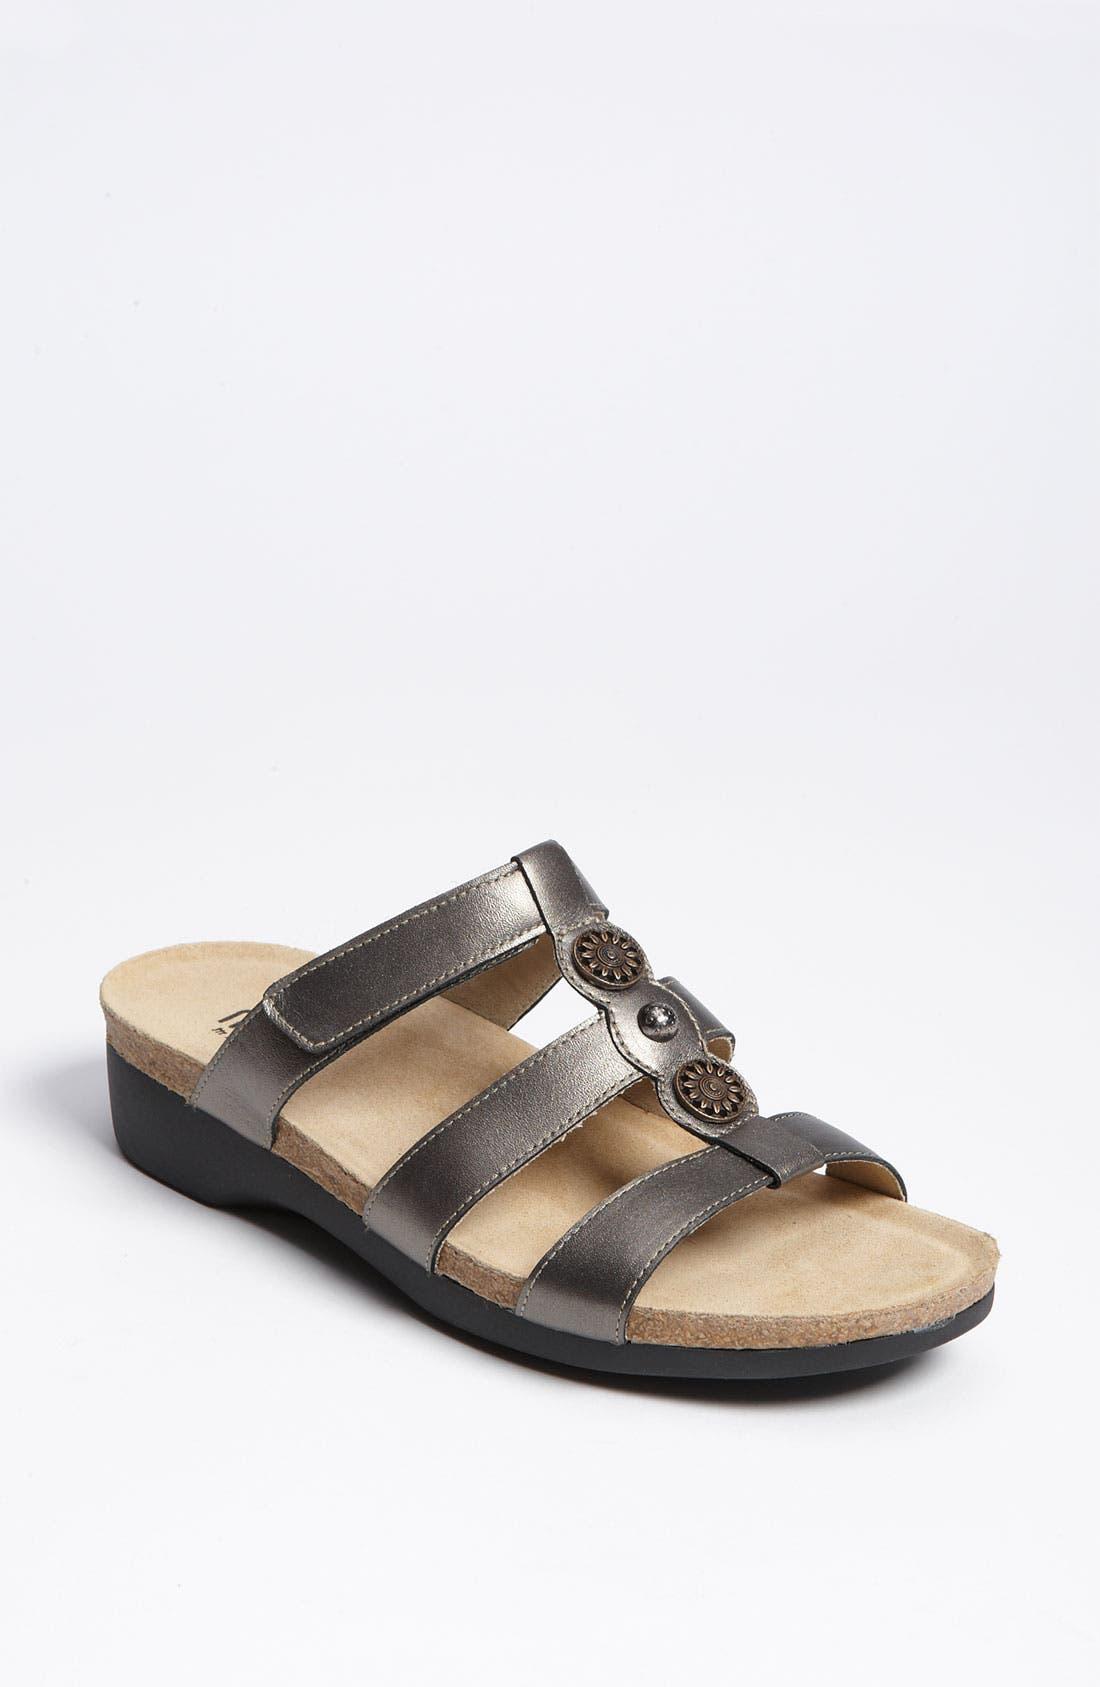 Main Image - Munro 'Virgo' Sandal